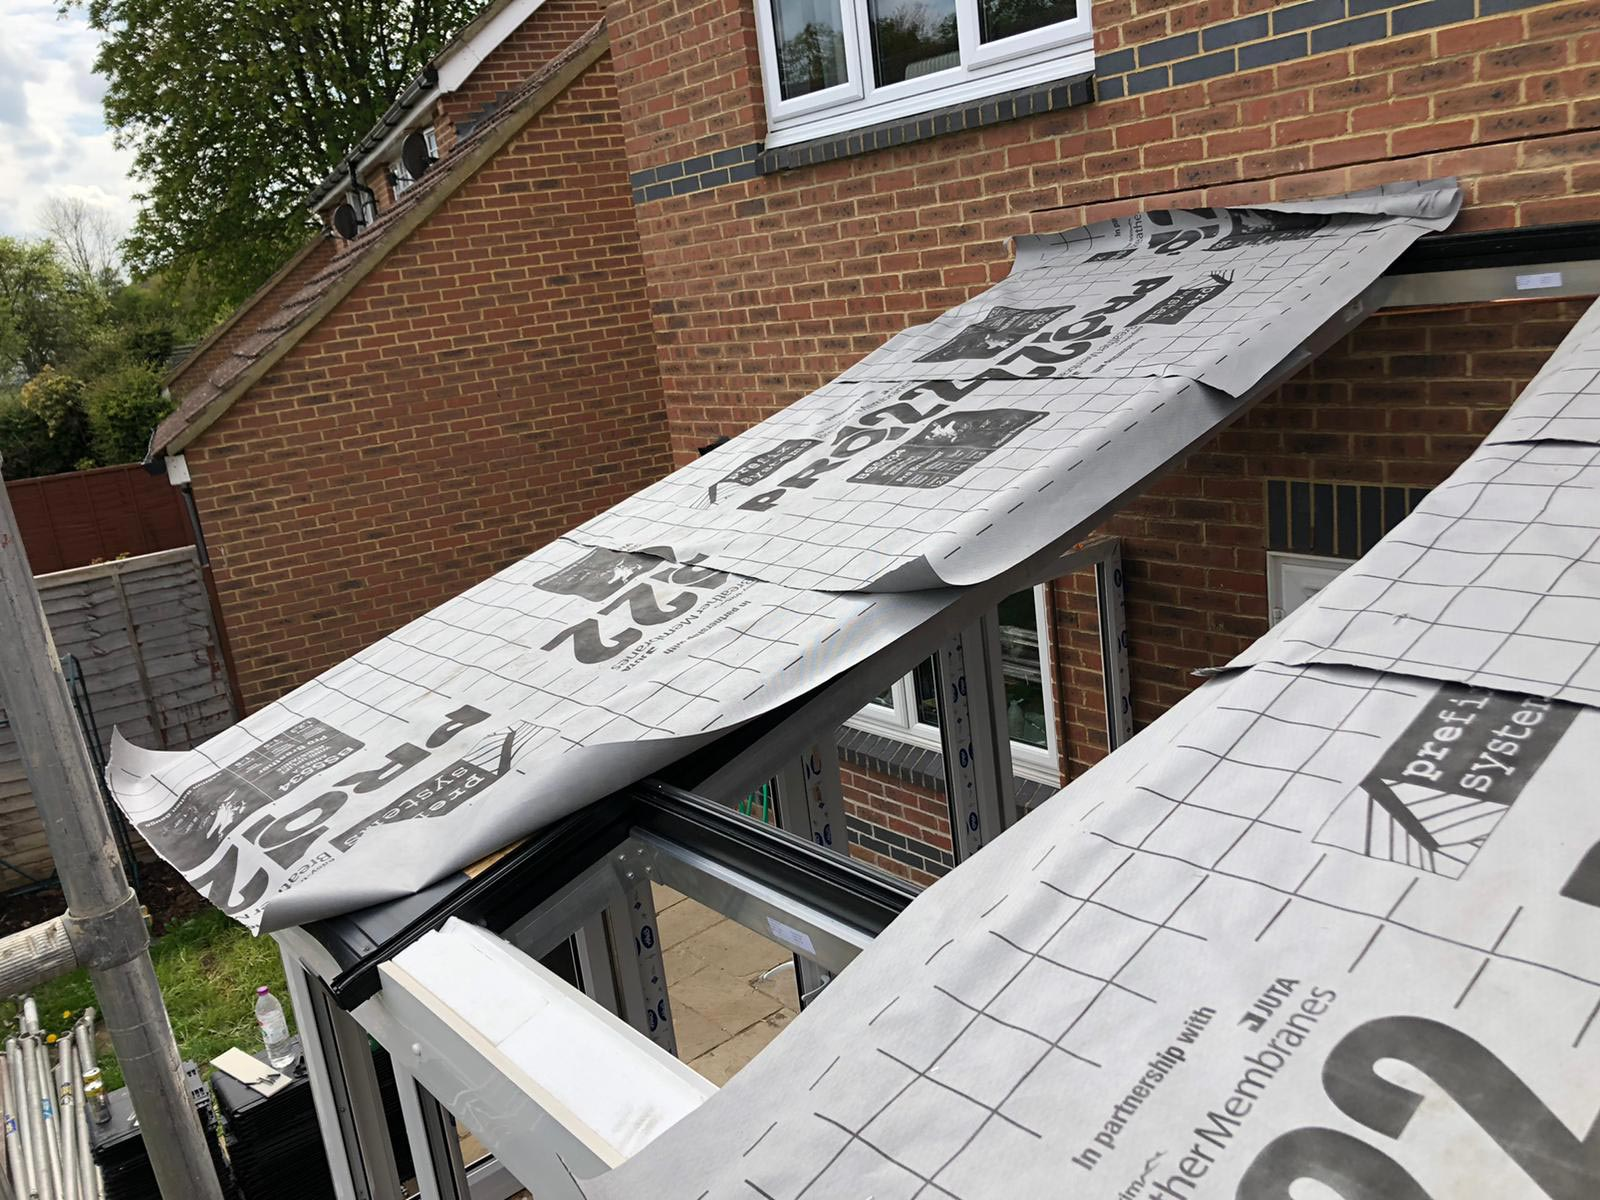 2105-half-dine-roof